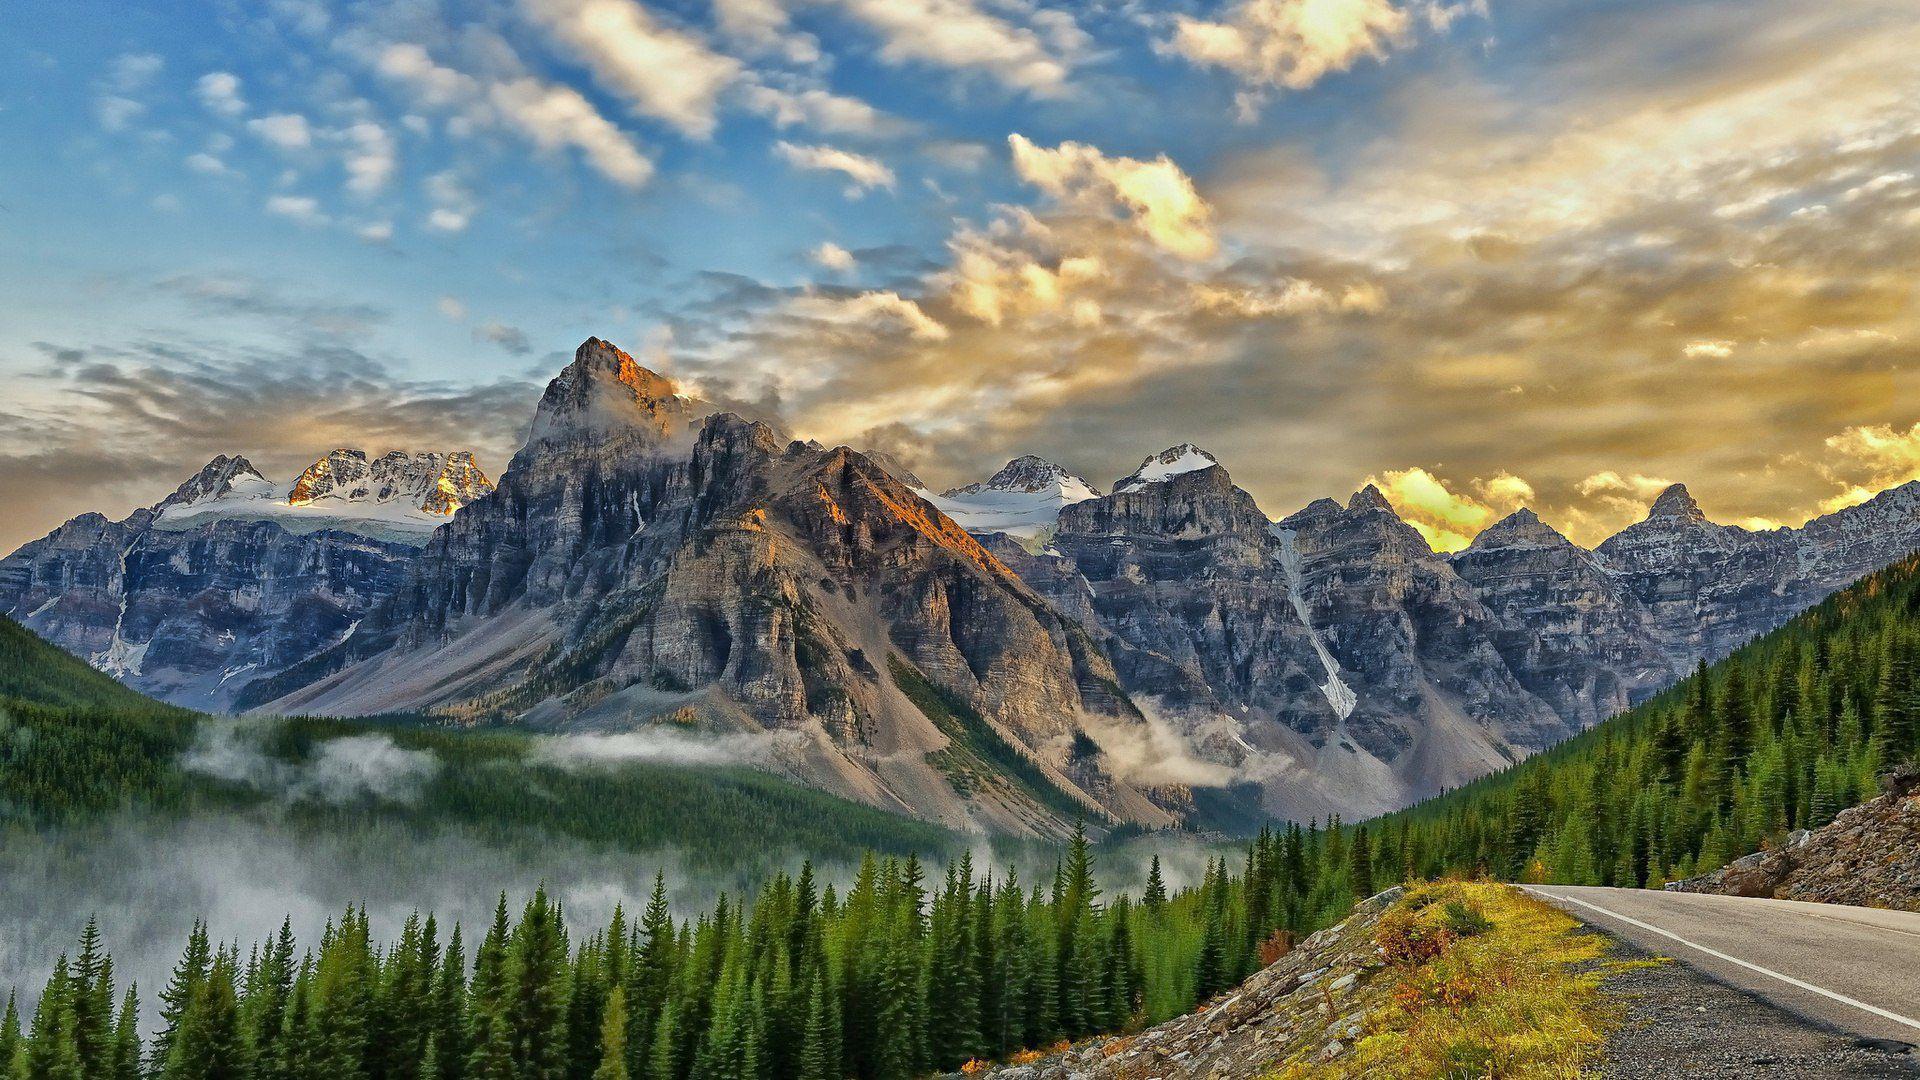 Valley Of Ten Peaks Wallpapers Hq